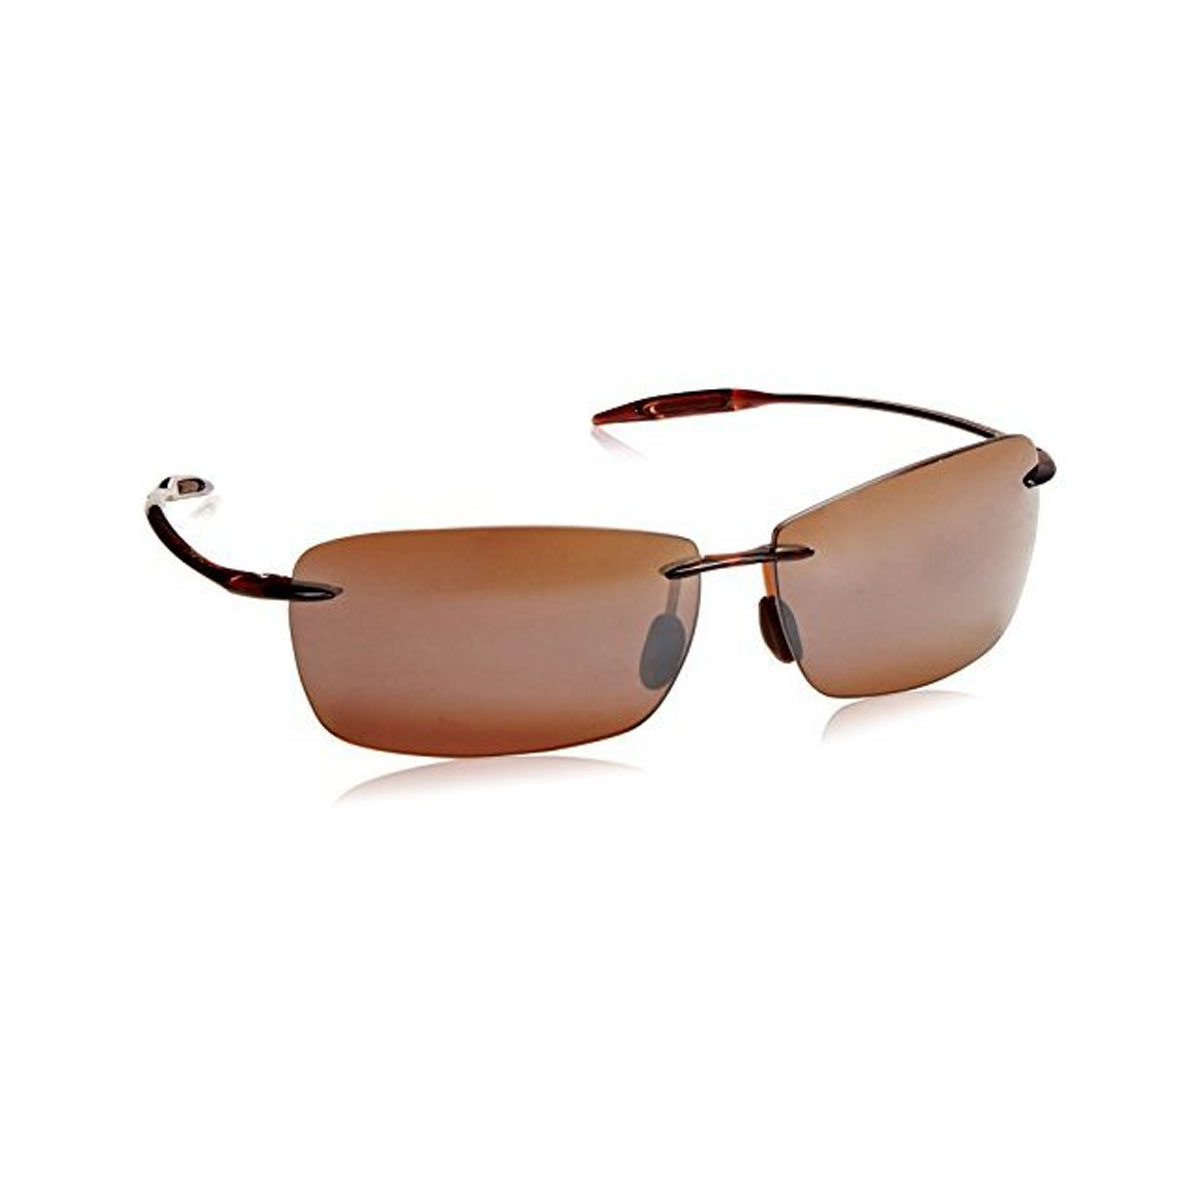 05422c60e2d7 Image of Maui Jim Lighthouse Sunglasses - HCL Bronze Lens